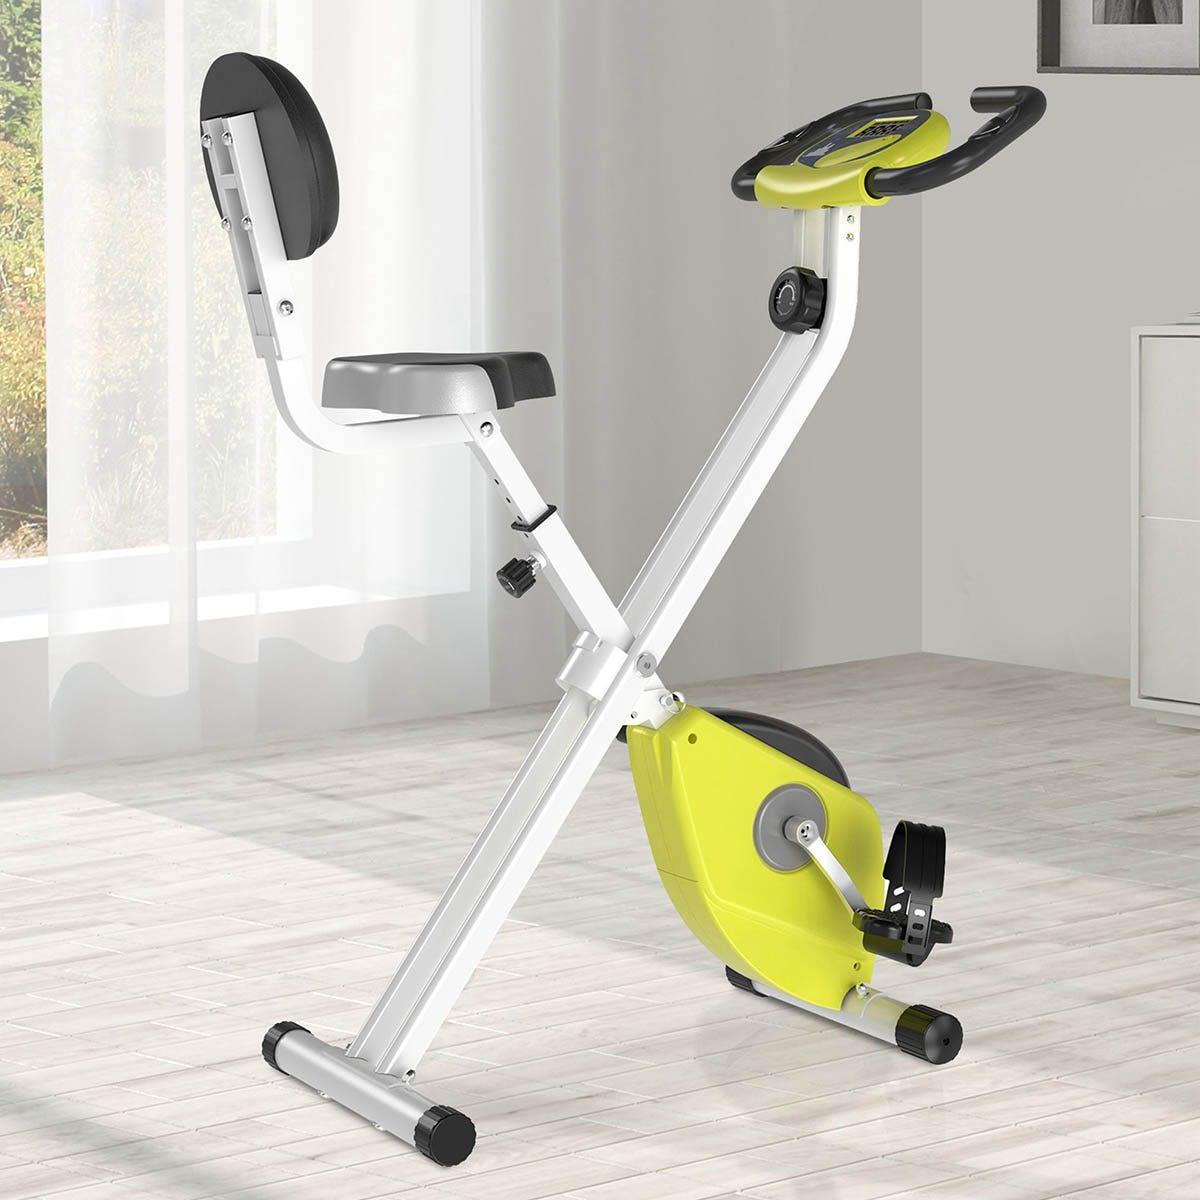 HOMCOM Magnetic Resistance Exercise Bike Foldable LCD Adjustable Seat Yellow